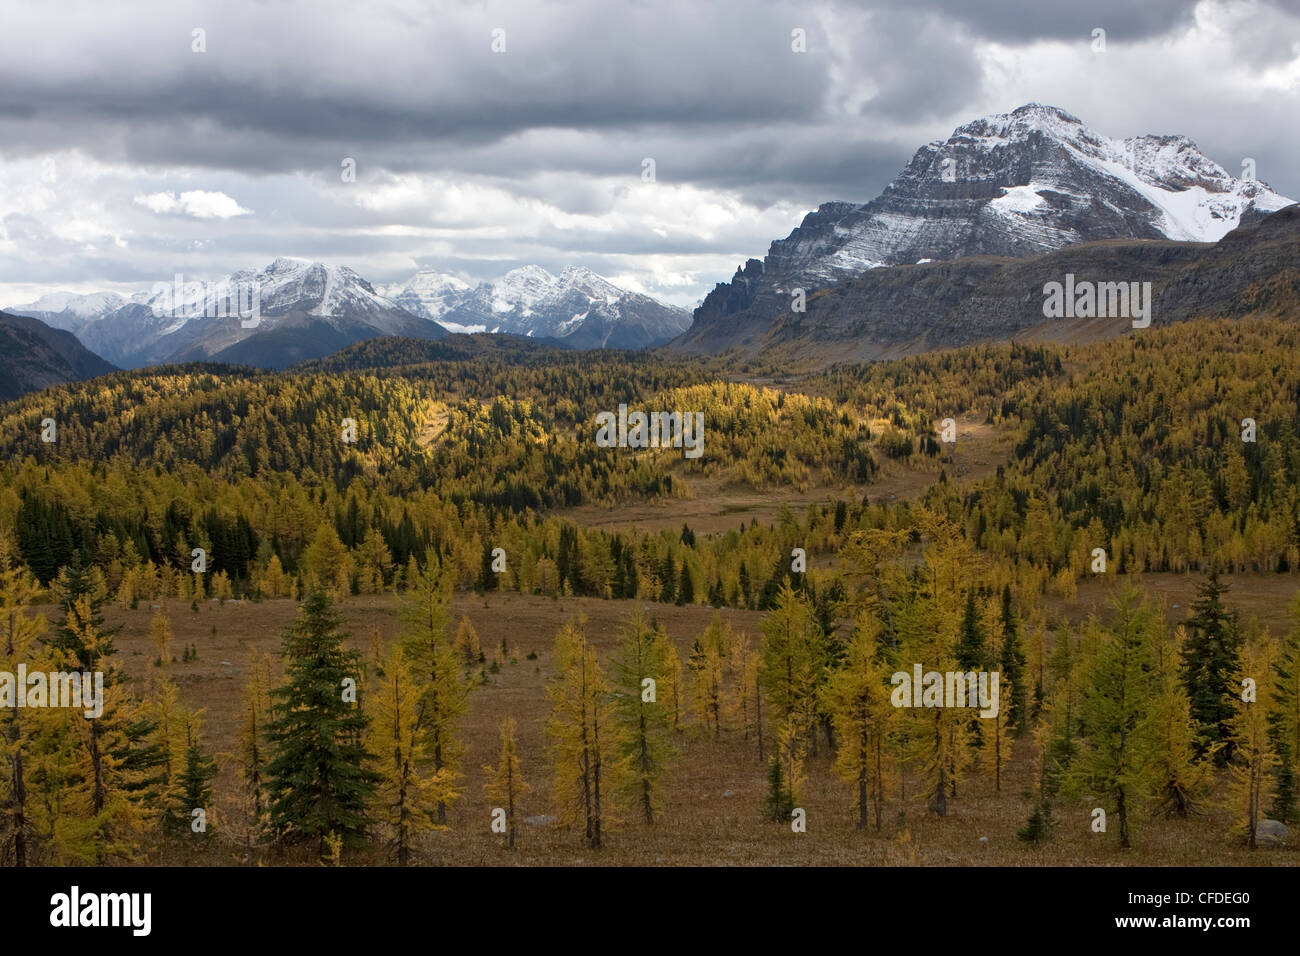 Trail to Titcomb Basin, Wind River Range, Wyoming, United States of America - Stock Image